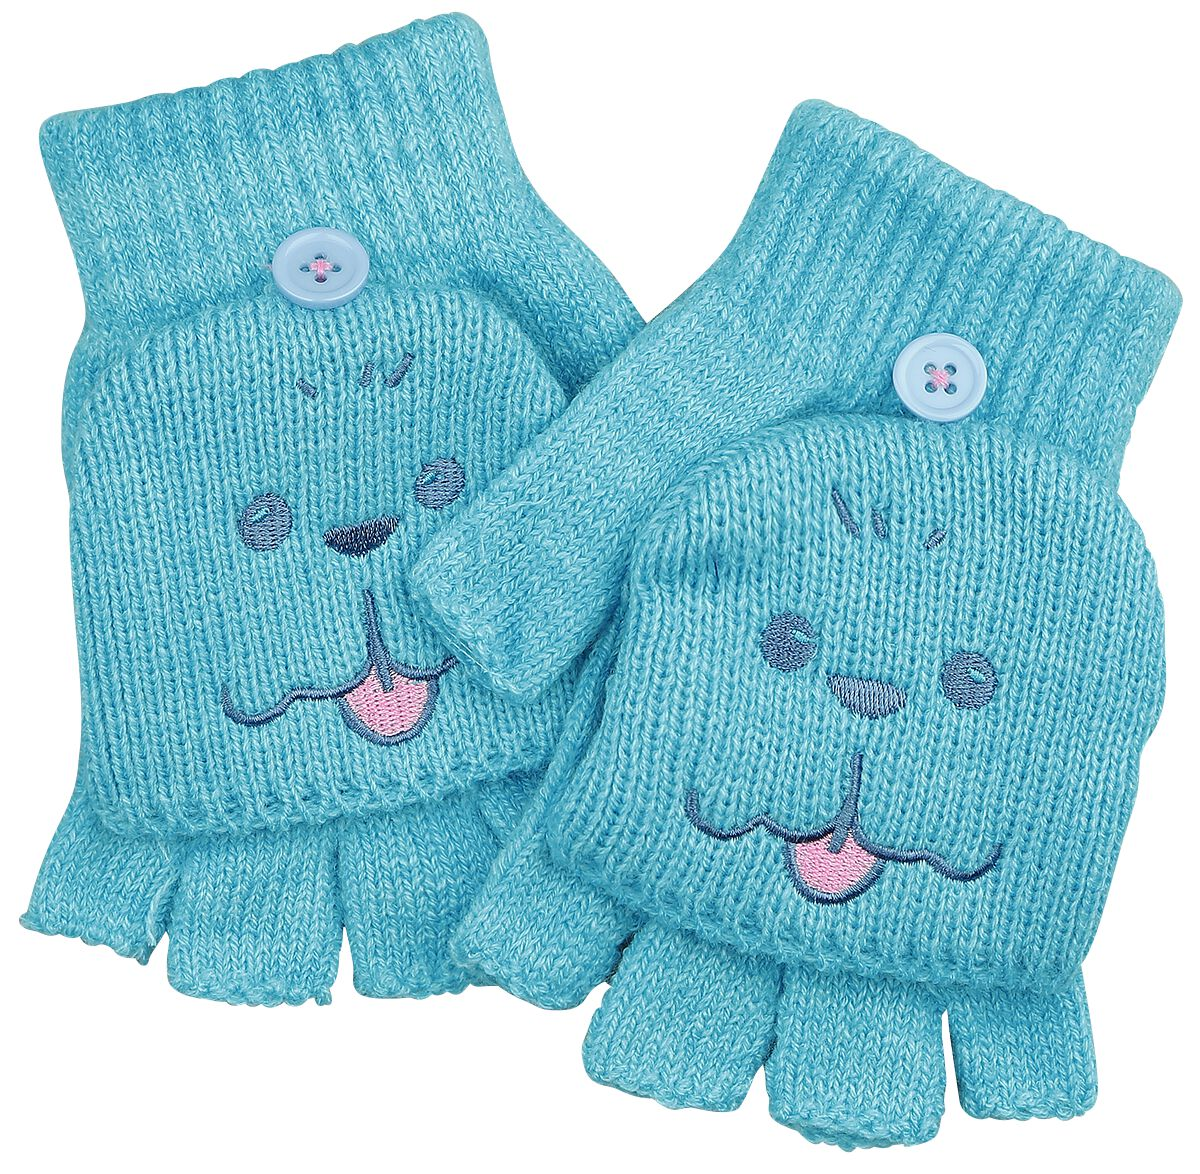 Handschuhe für Frauen - Yuri!!! On Ice Makkachin Fingerlose Handschuhe blau  - Onlineshop EMP